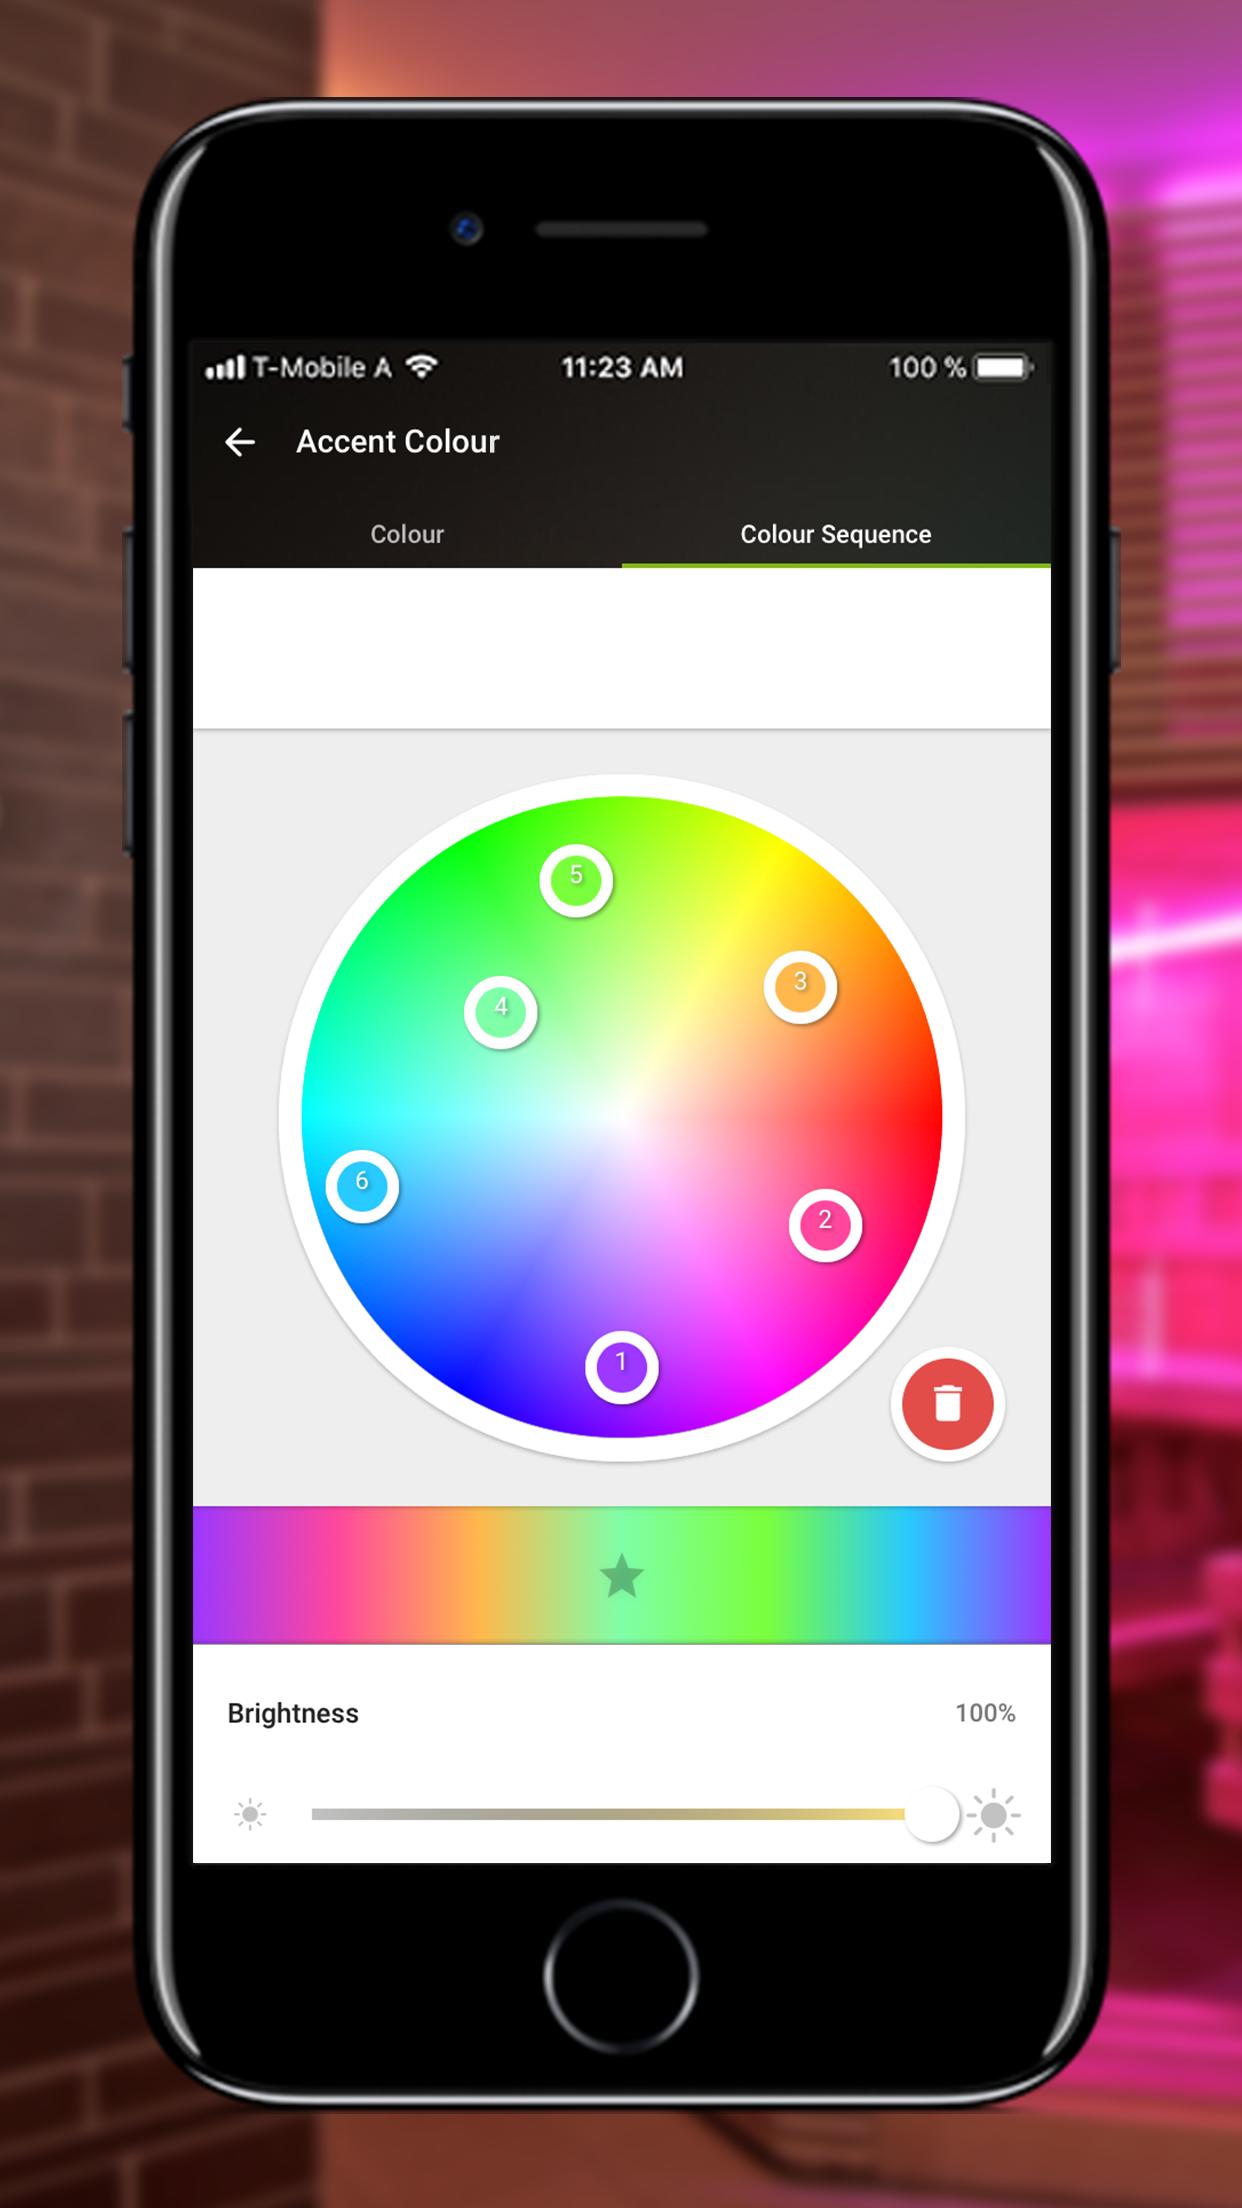 Kostenlos Android Apps Downloaden